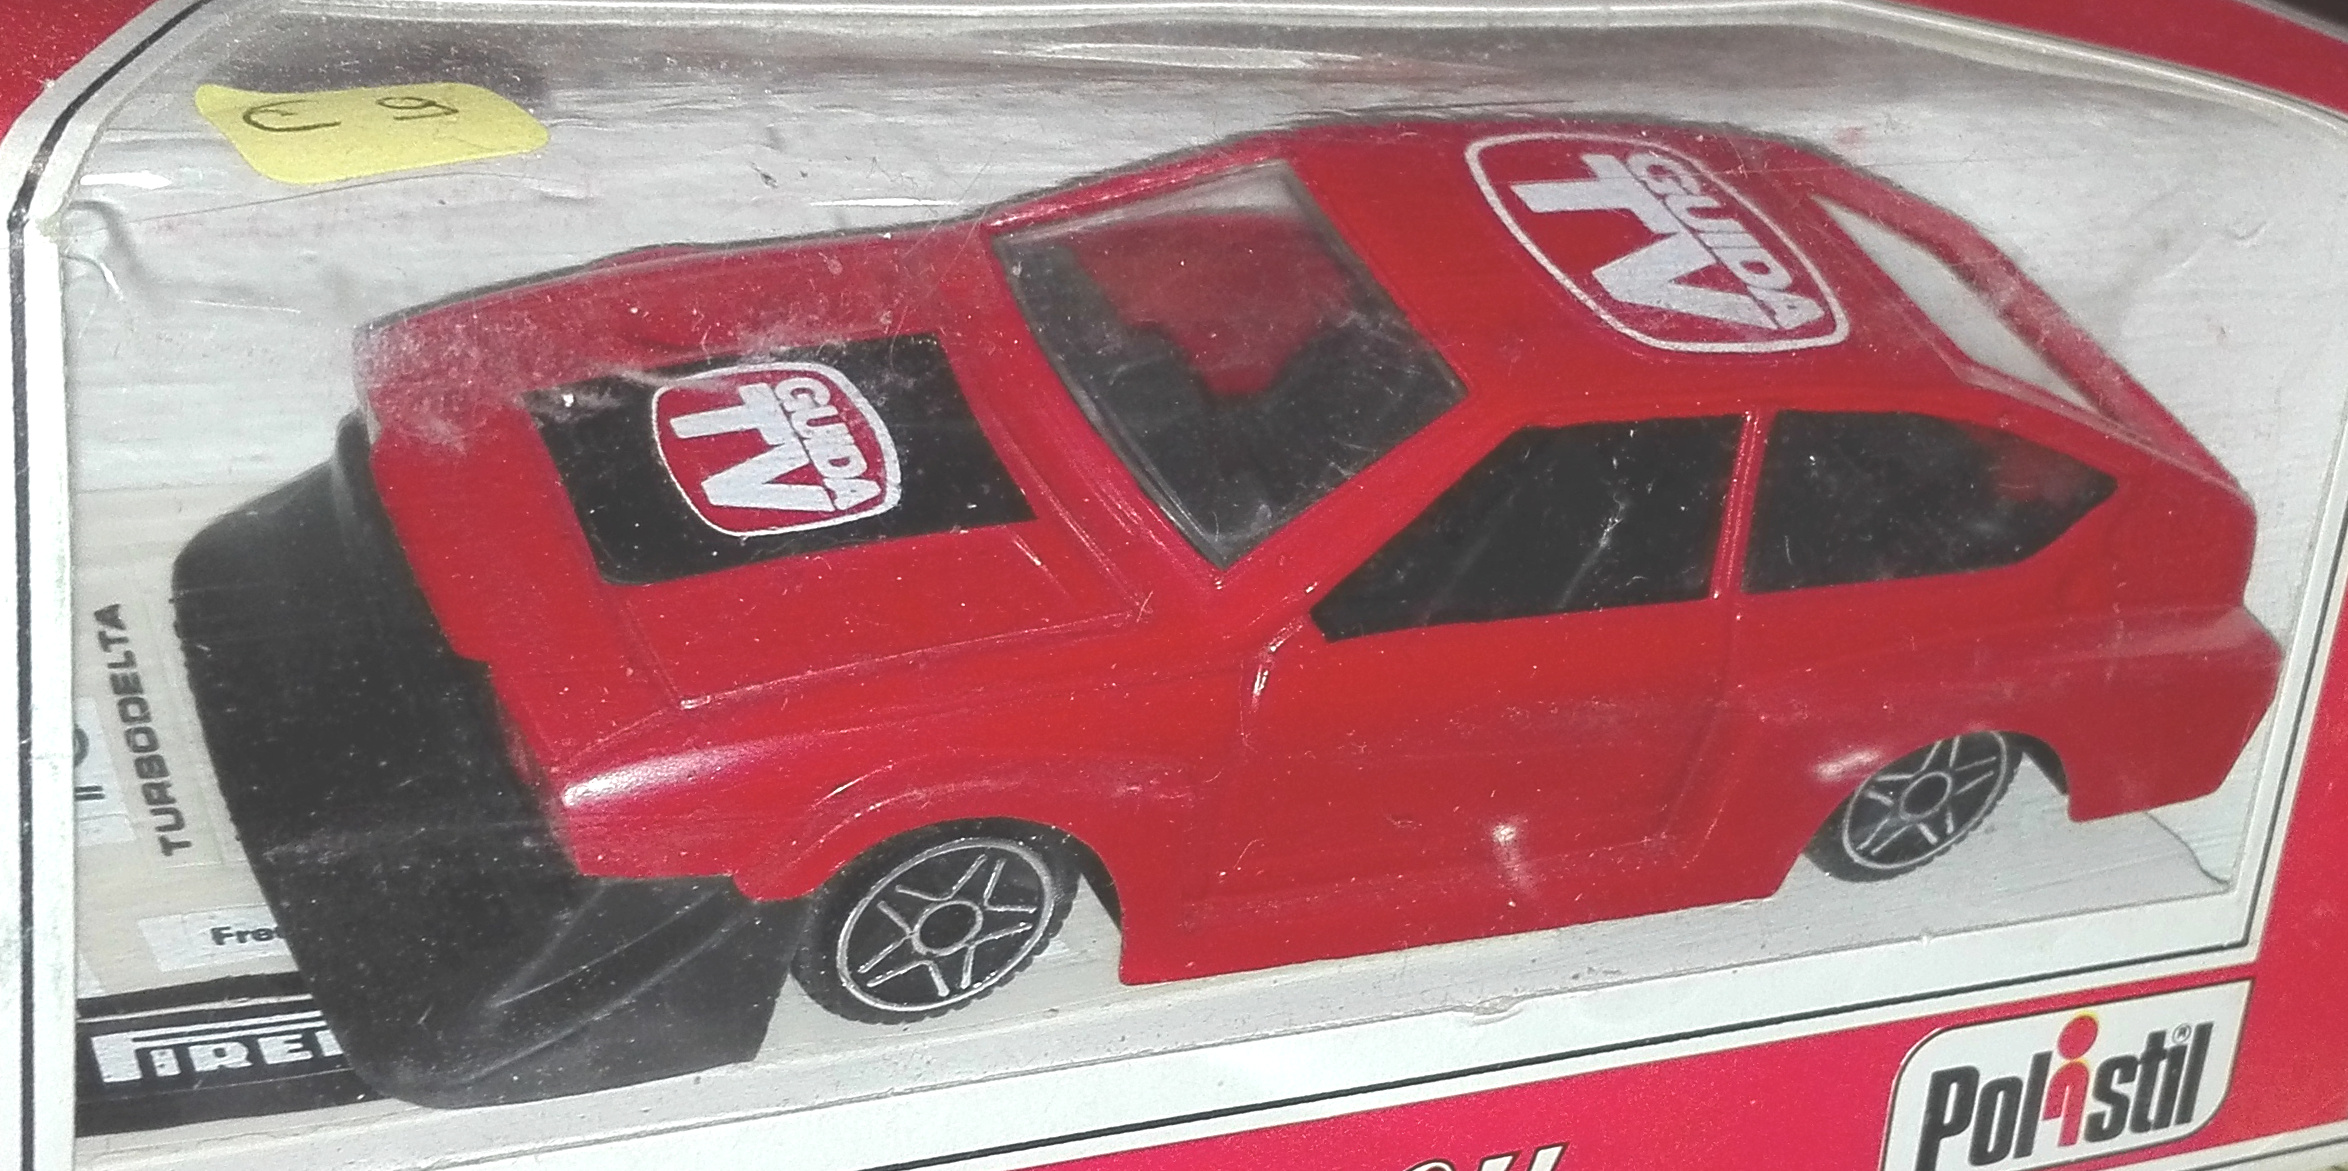 E2004, Alfa Romeo Alfetta GTV 2000 Turbo Delta (Guida TV)